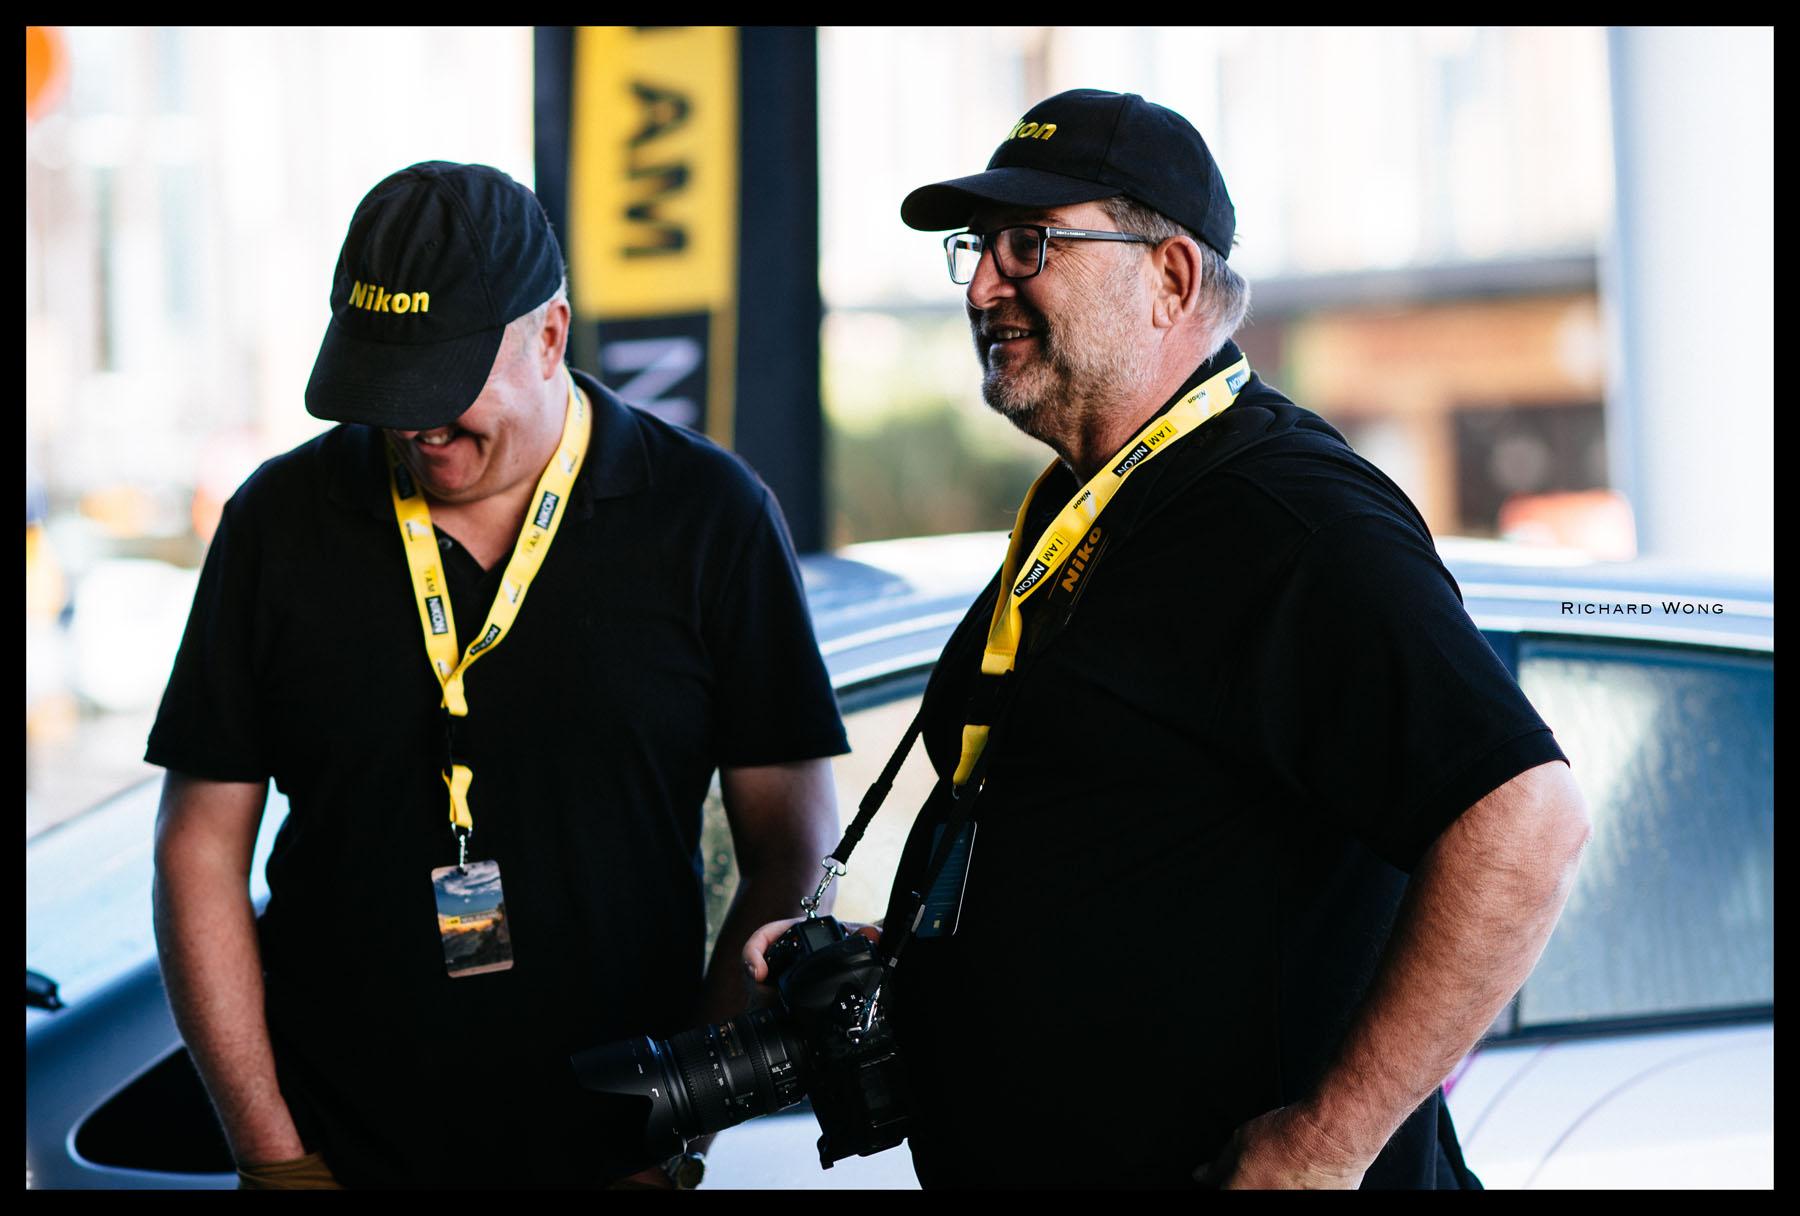 Nikon-Auckland-Photo-Day-2016-07